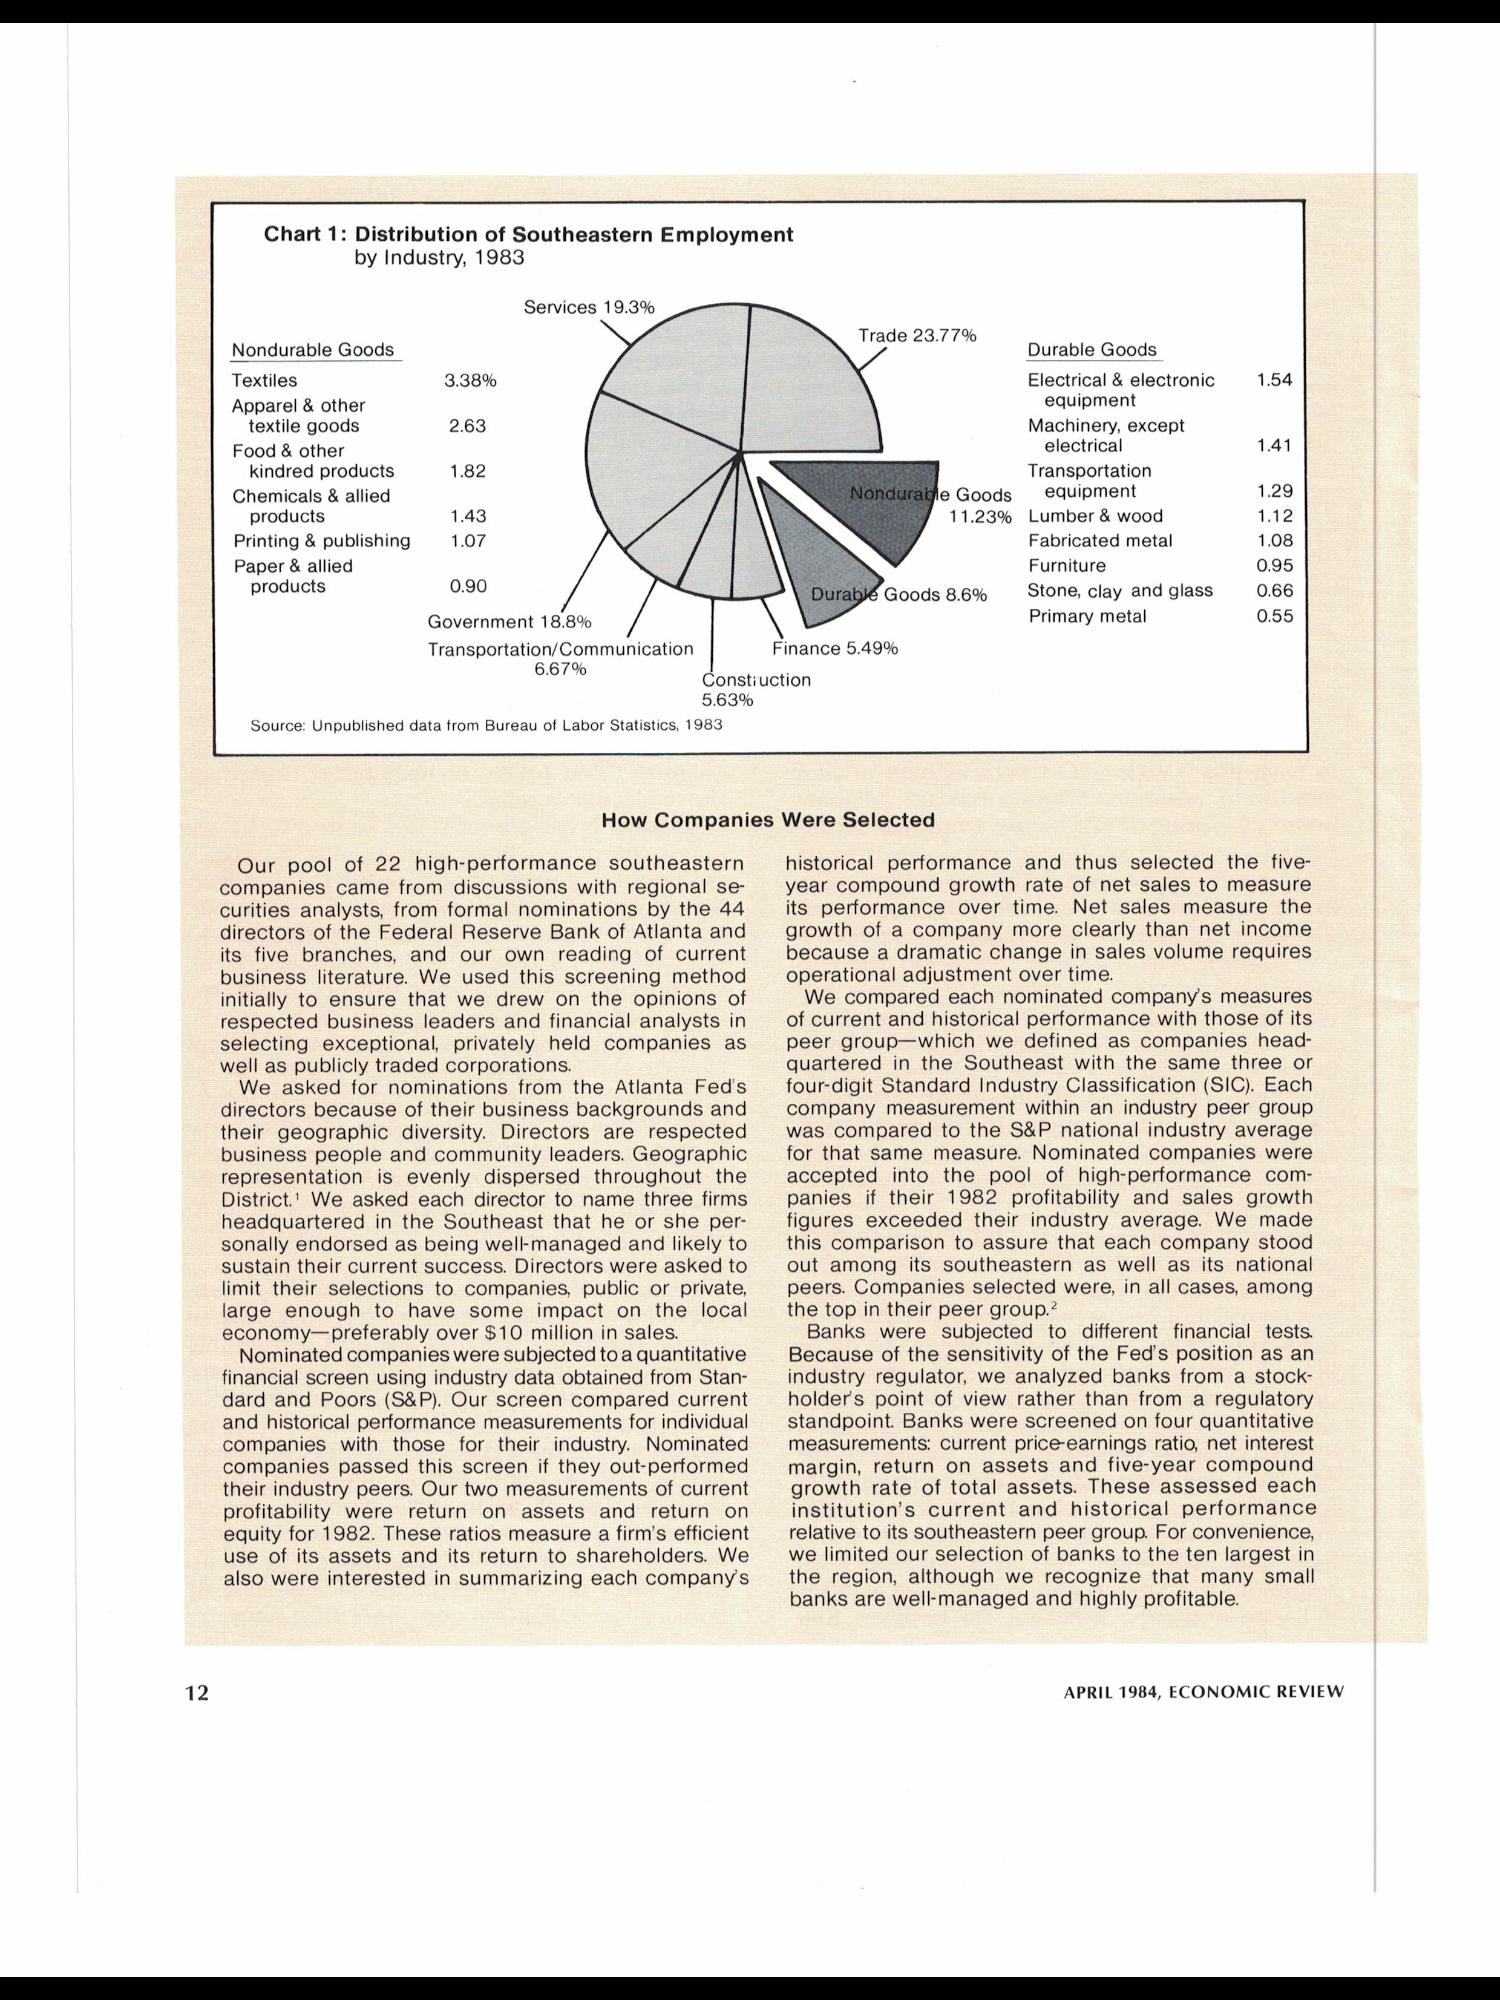 High-Performance-Companies-9